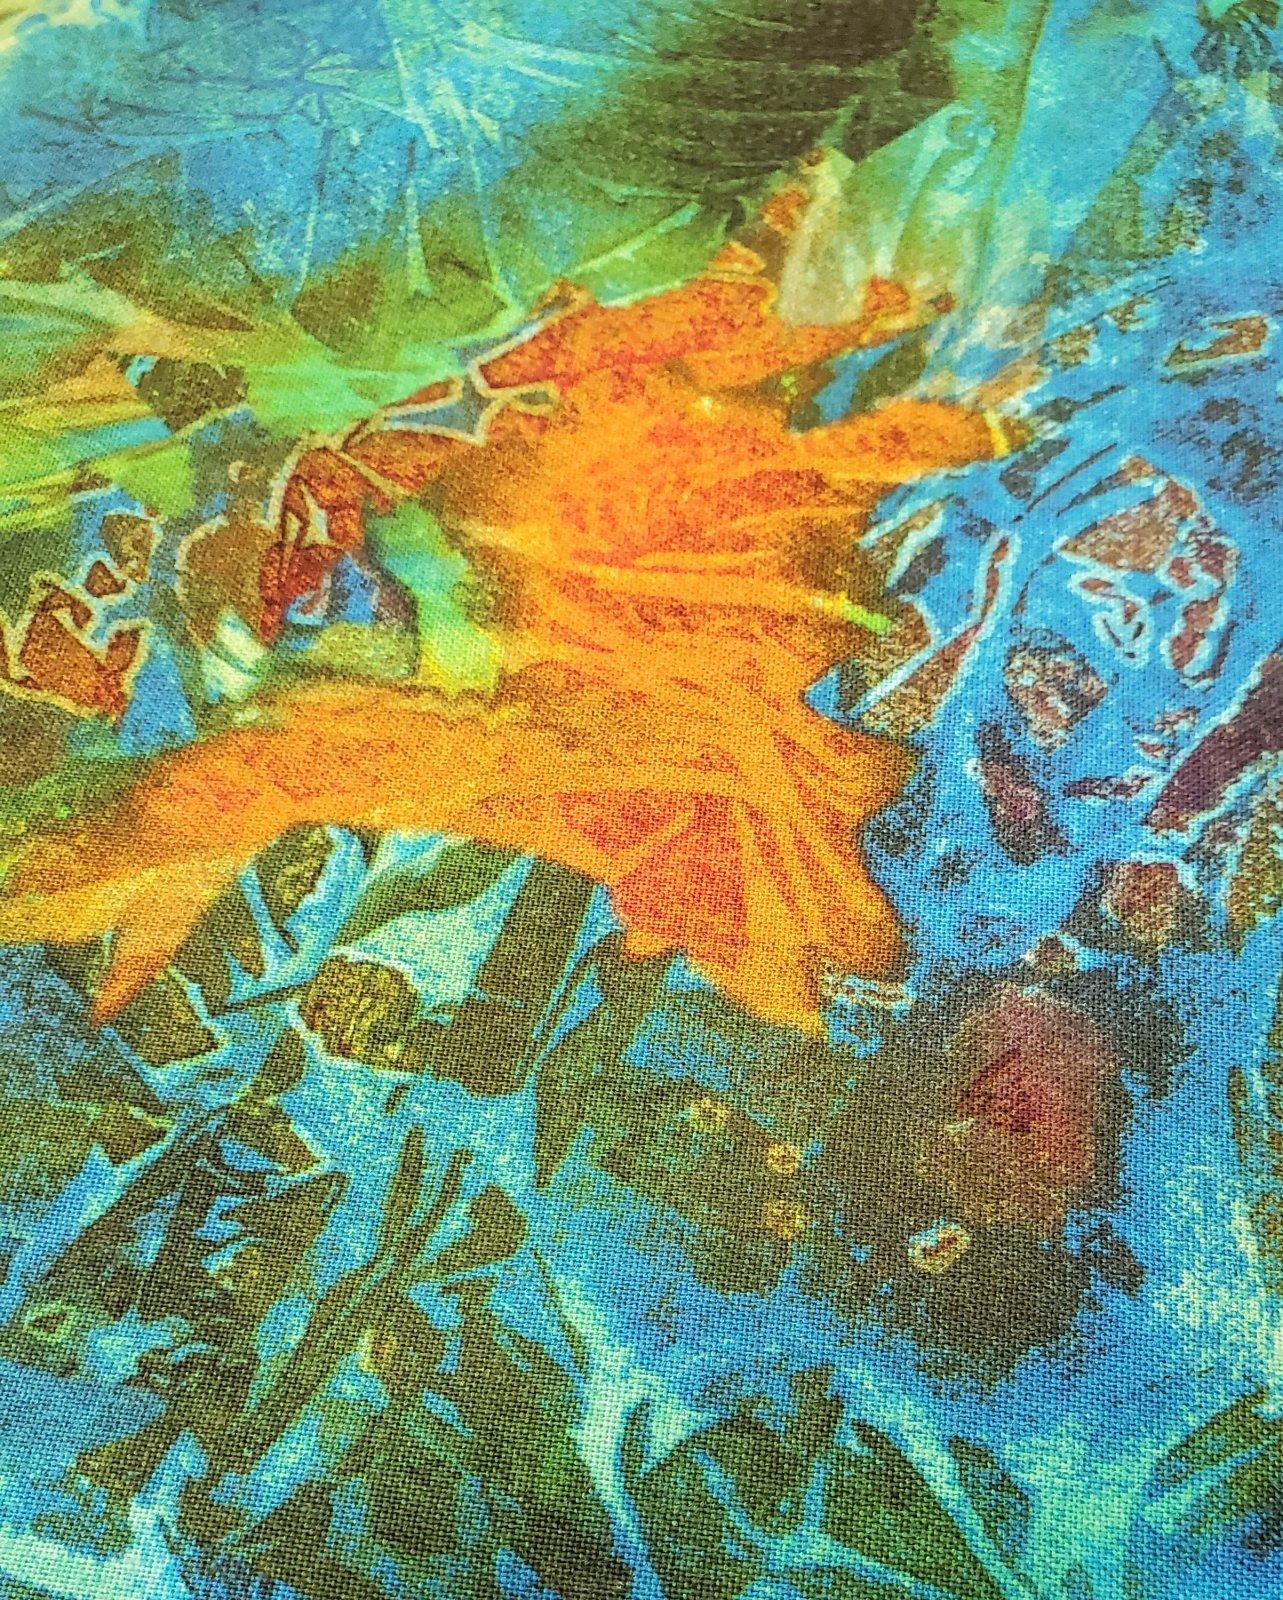 Teal  Batik Texture Digitally 45